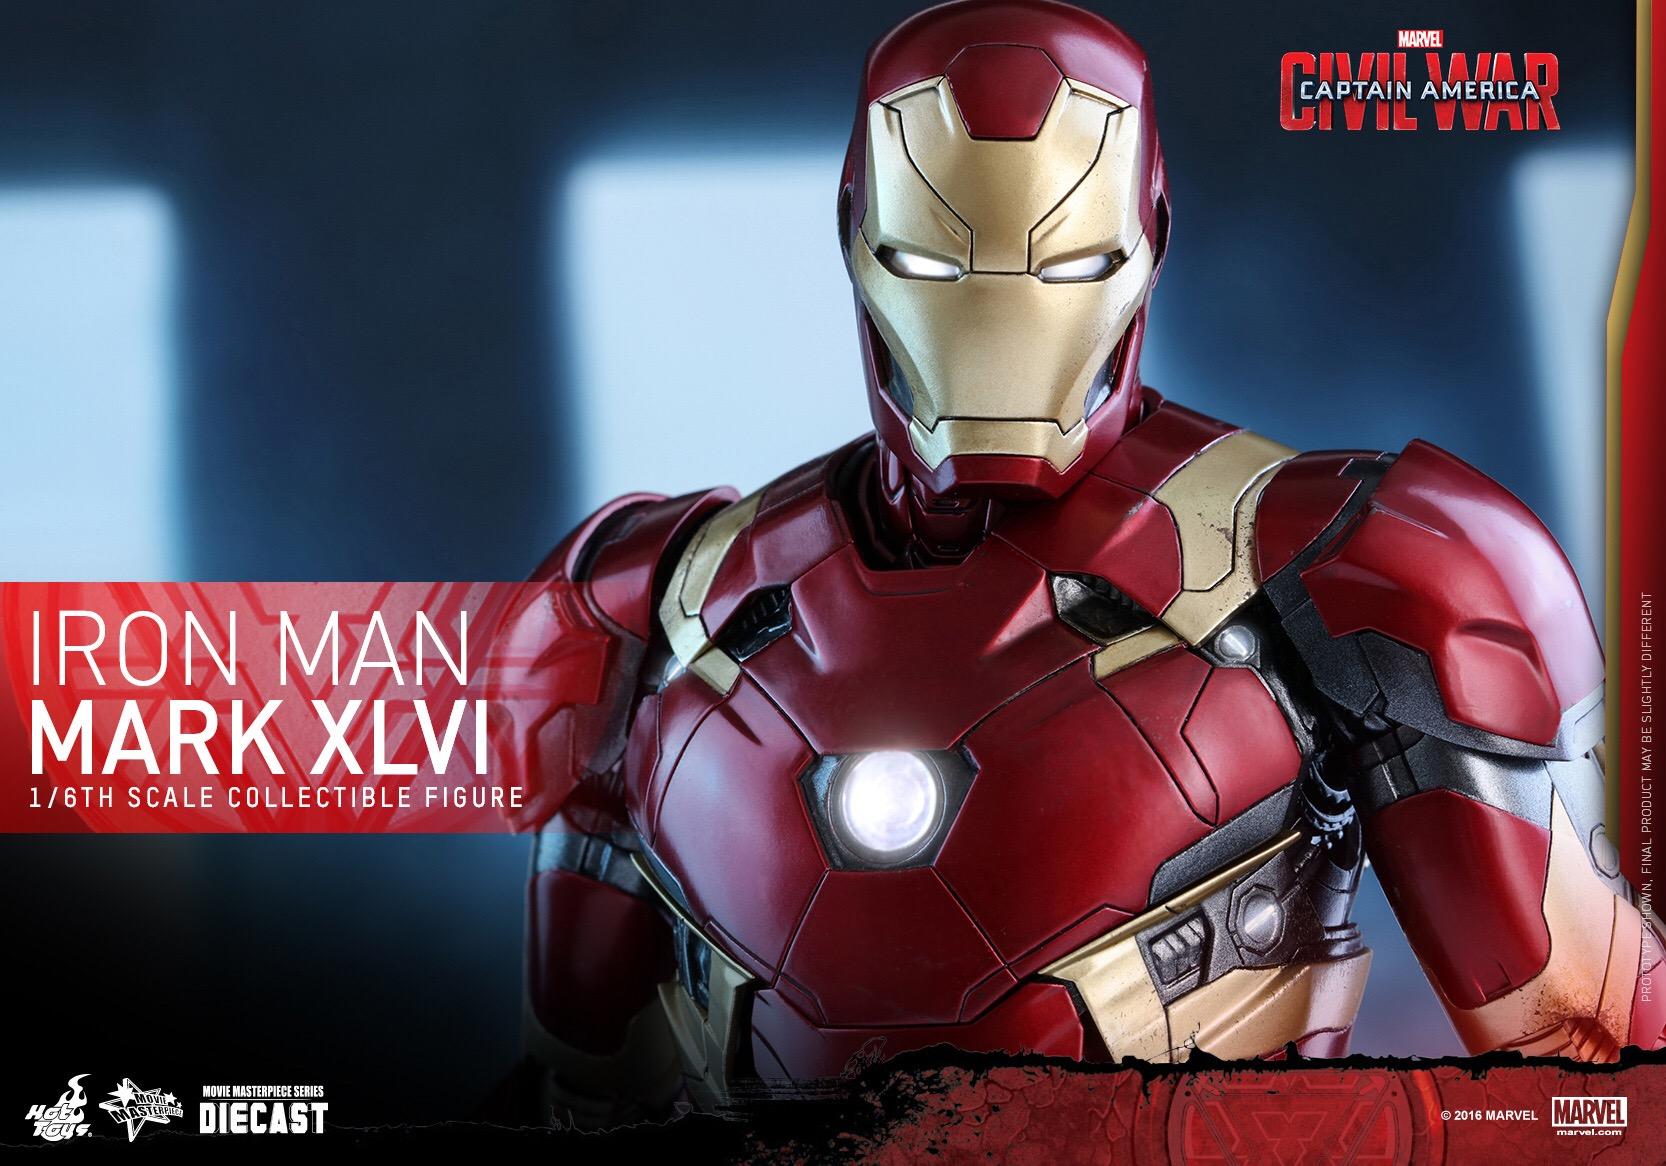 CAPTAIN AMERICA : CIVIL WAR - IRON MAN MARK XLVI (MMS353DC16) 160420020906392826